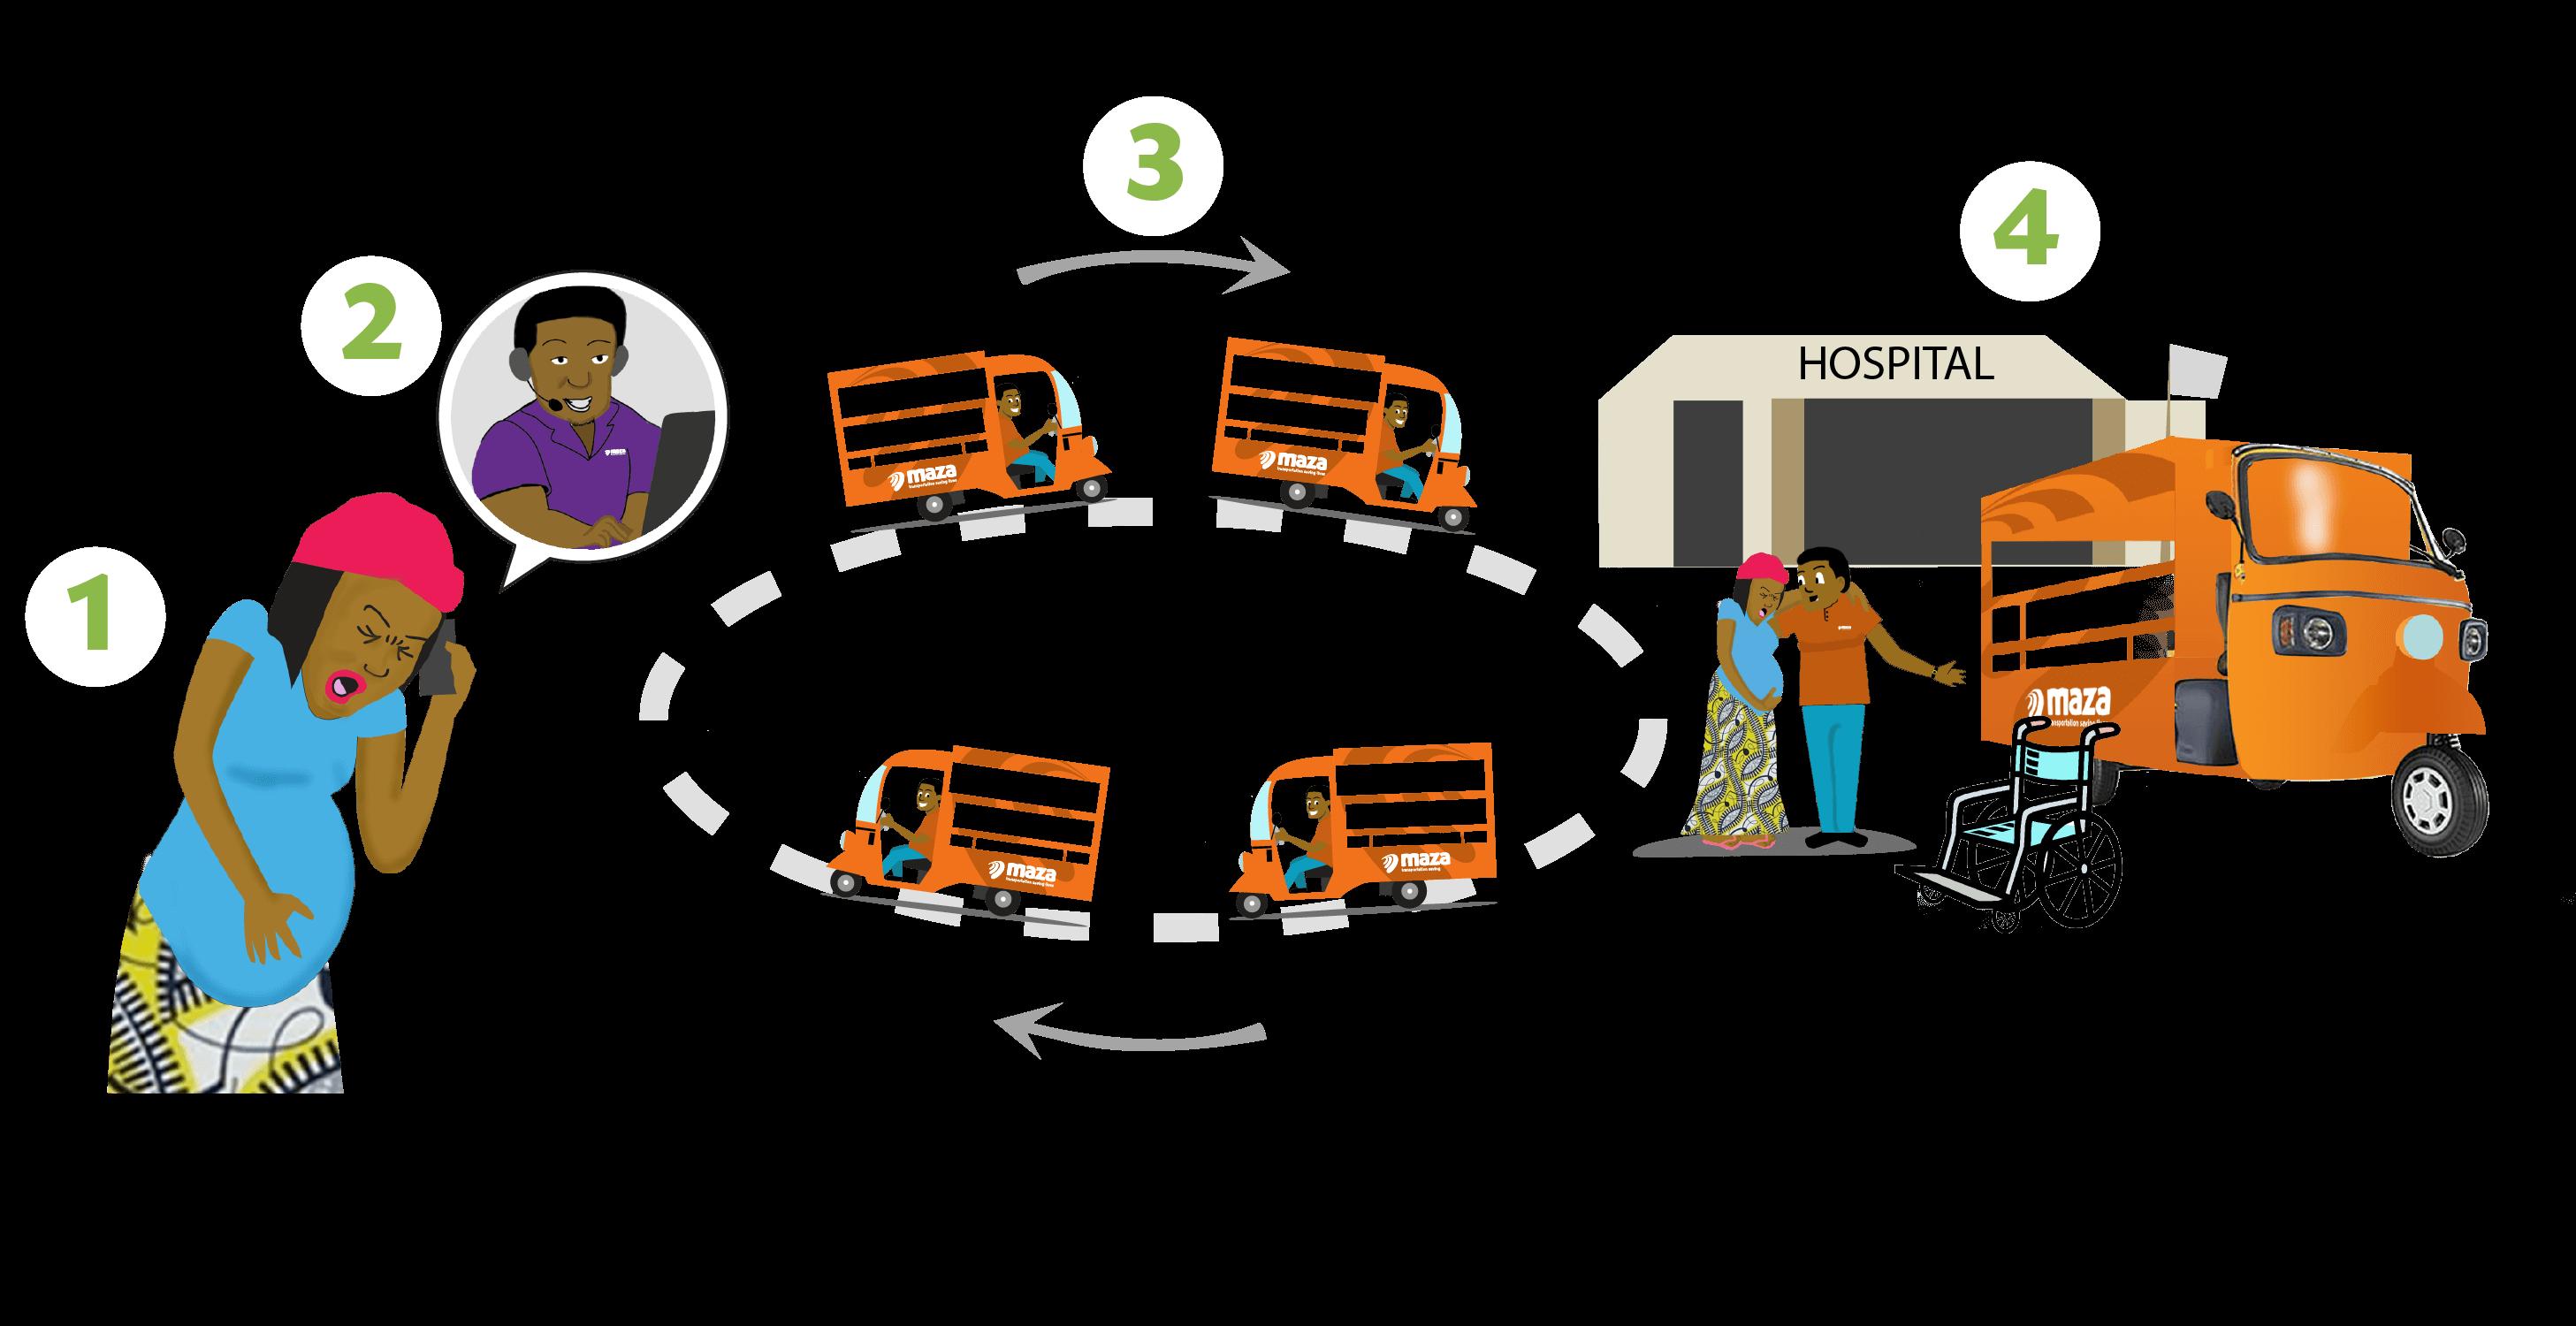 Maza transportation saving lives. Community clipart rural community